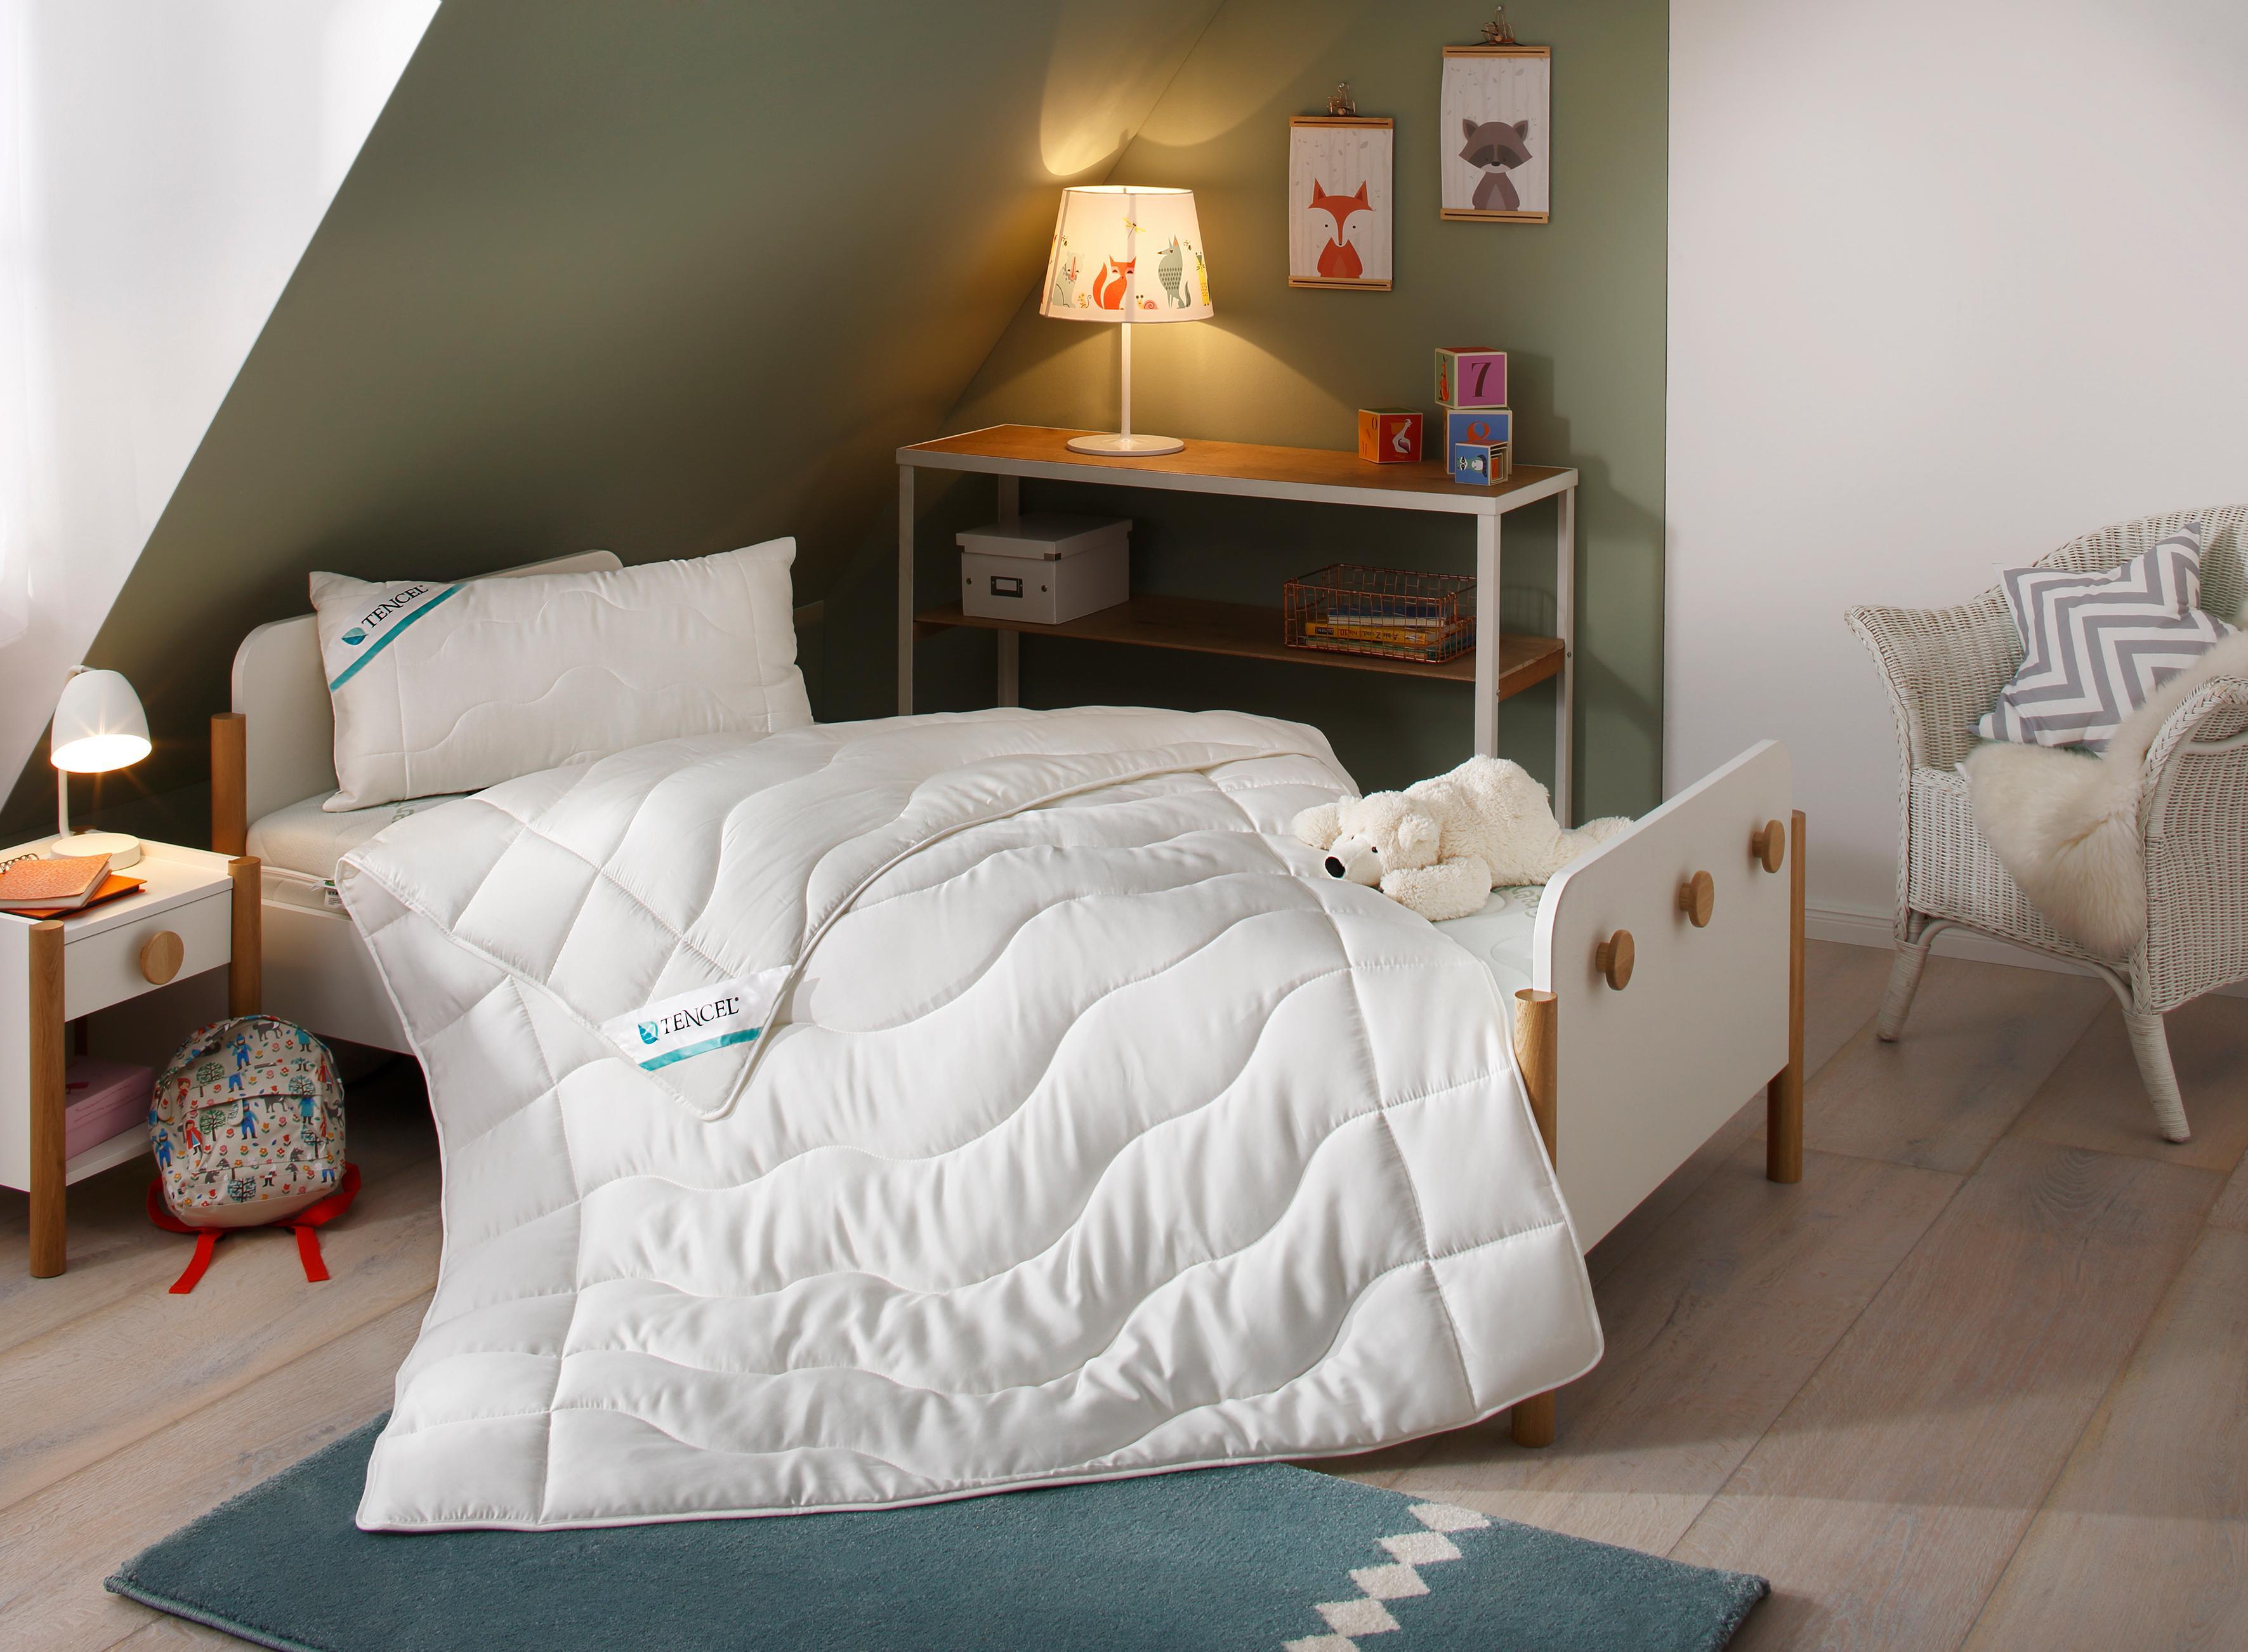 Kinderbettdecke + Kopfkissen TENCEL Lüttenhütt normal Füllung: Lyocell (TENCEL) Polyester